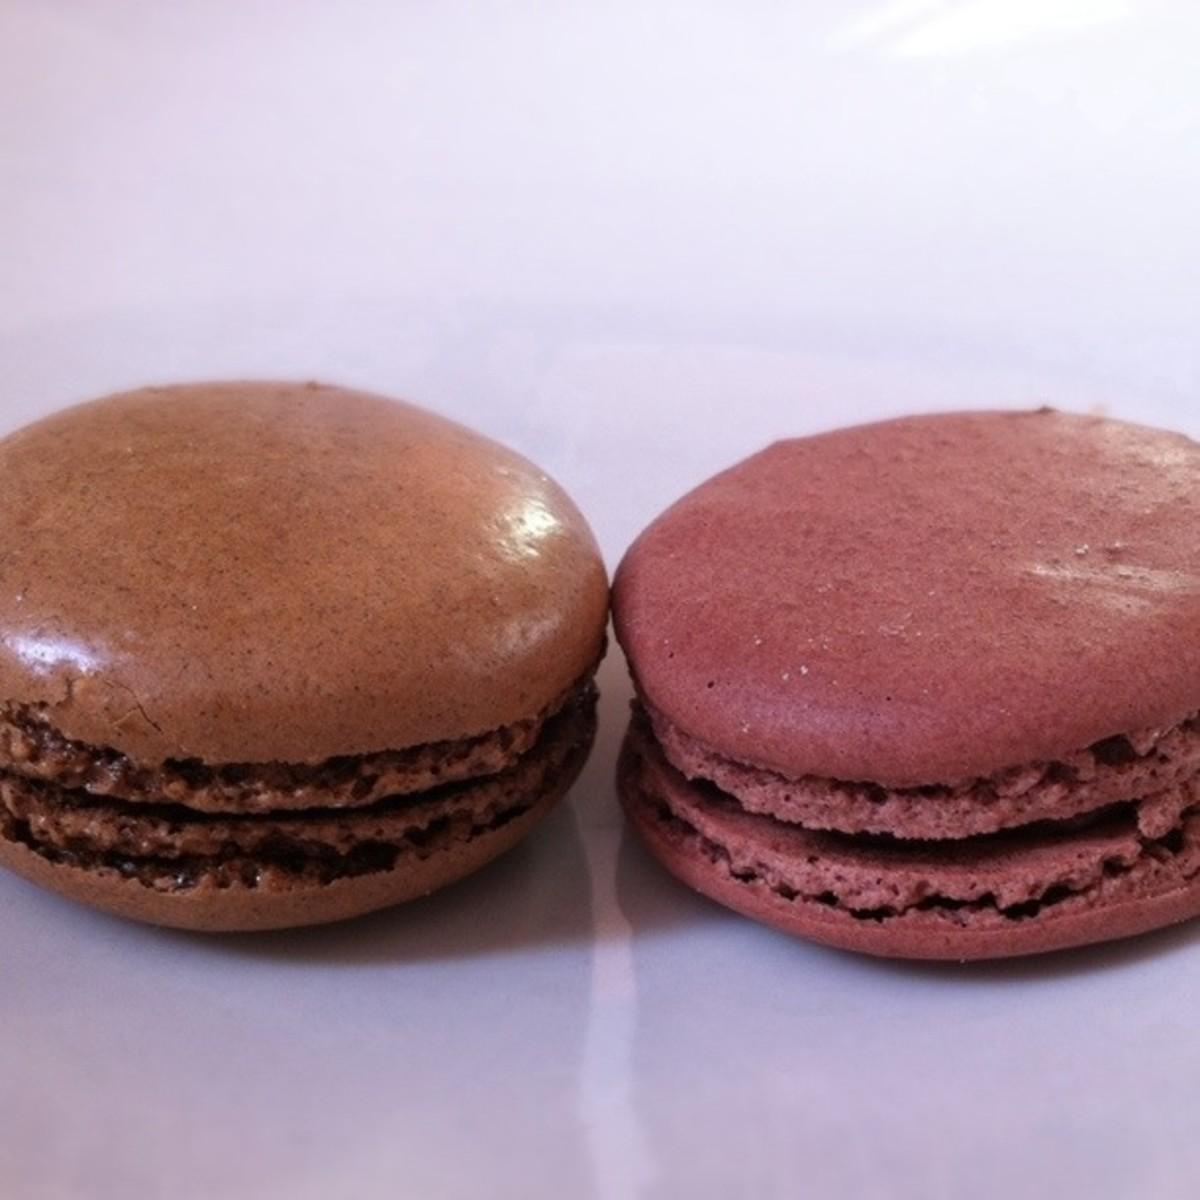 CHOCOLATE    (L – McMacaron, R - Ladurée)